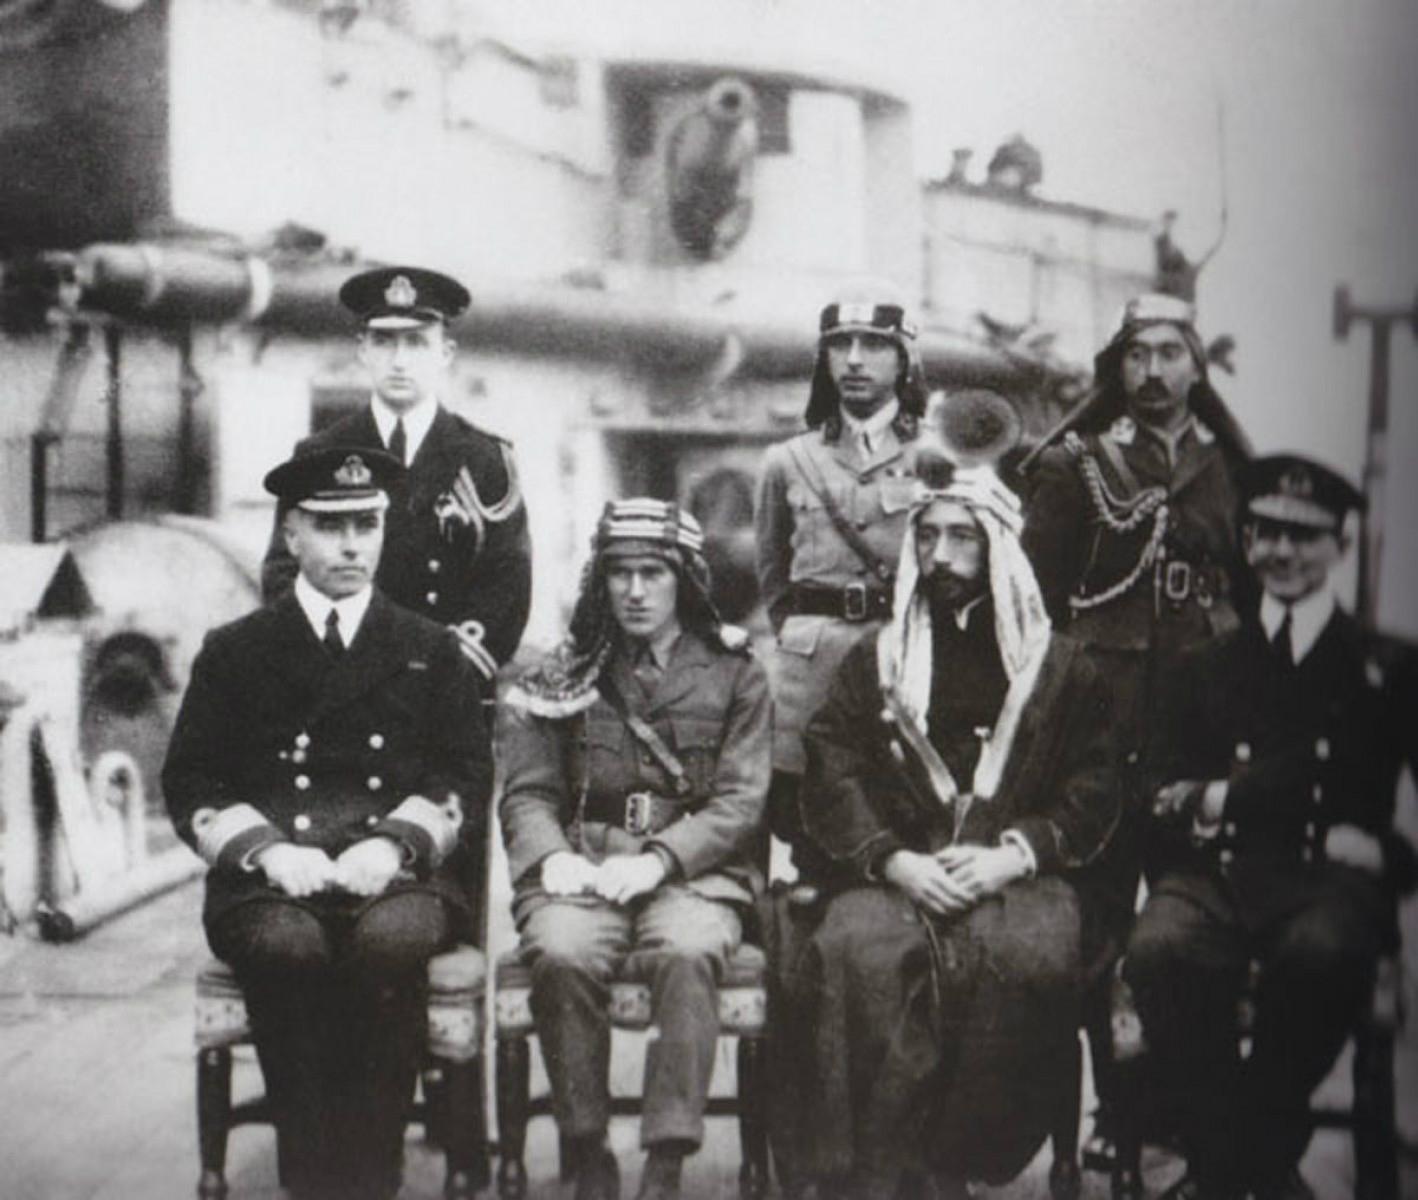 T.E. Lawrence & Emir Faisal